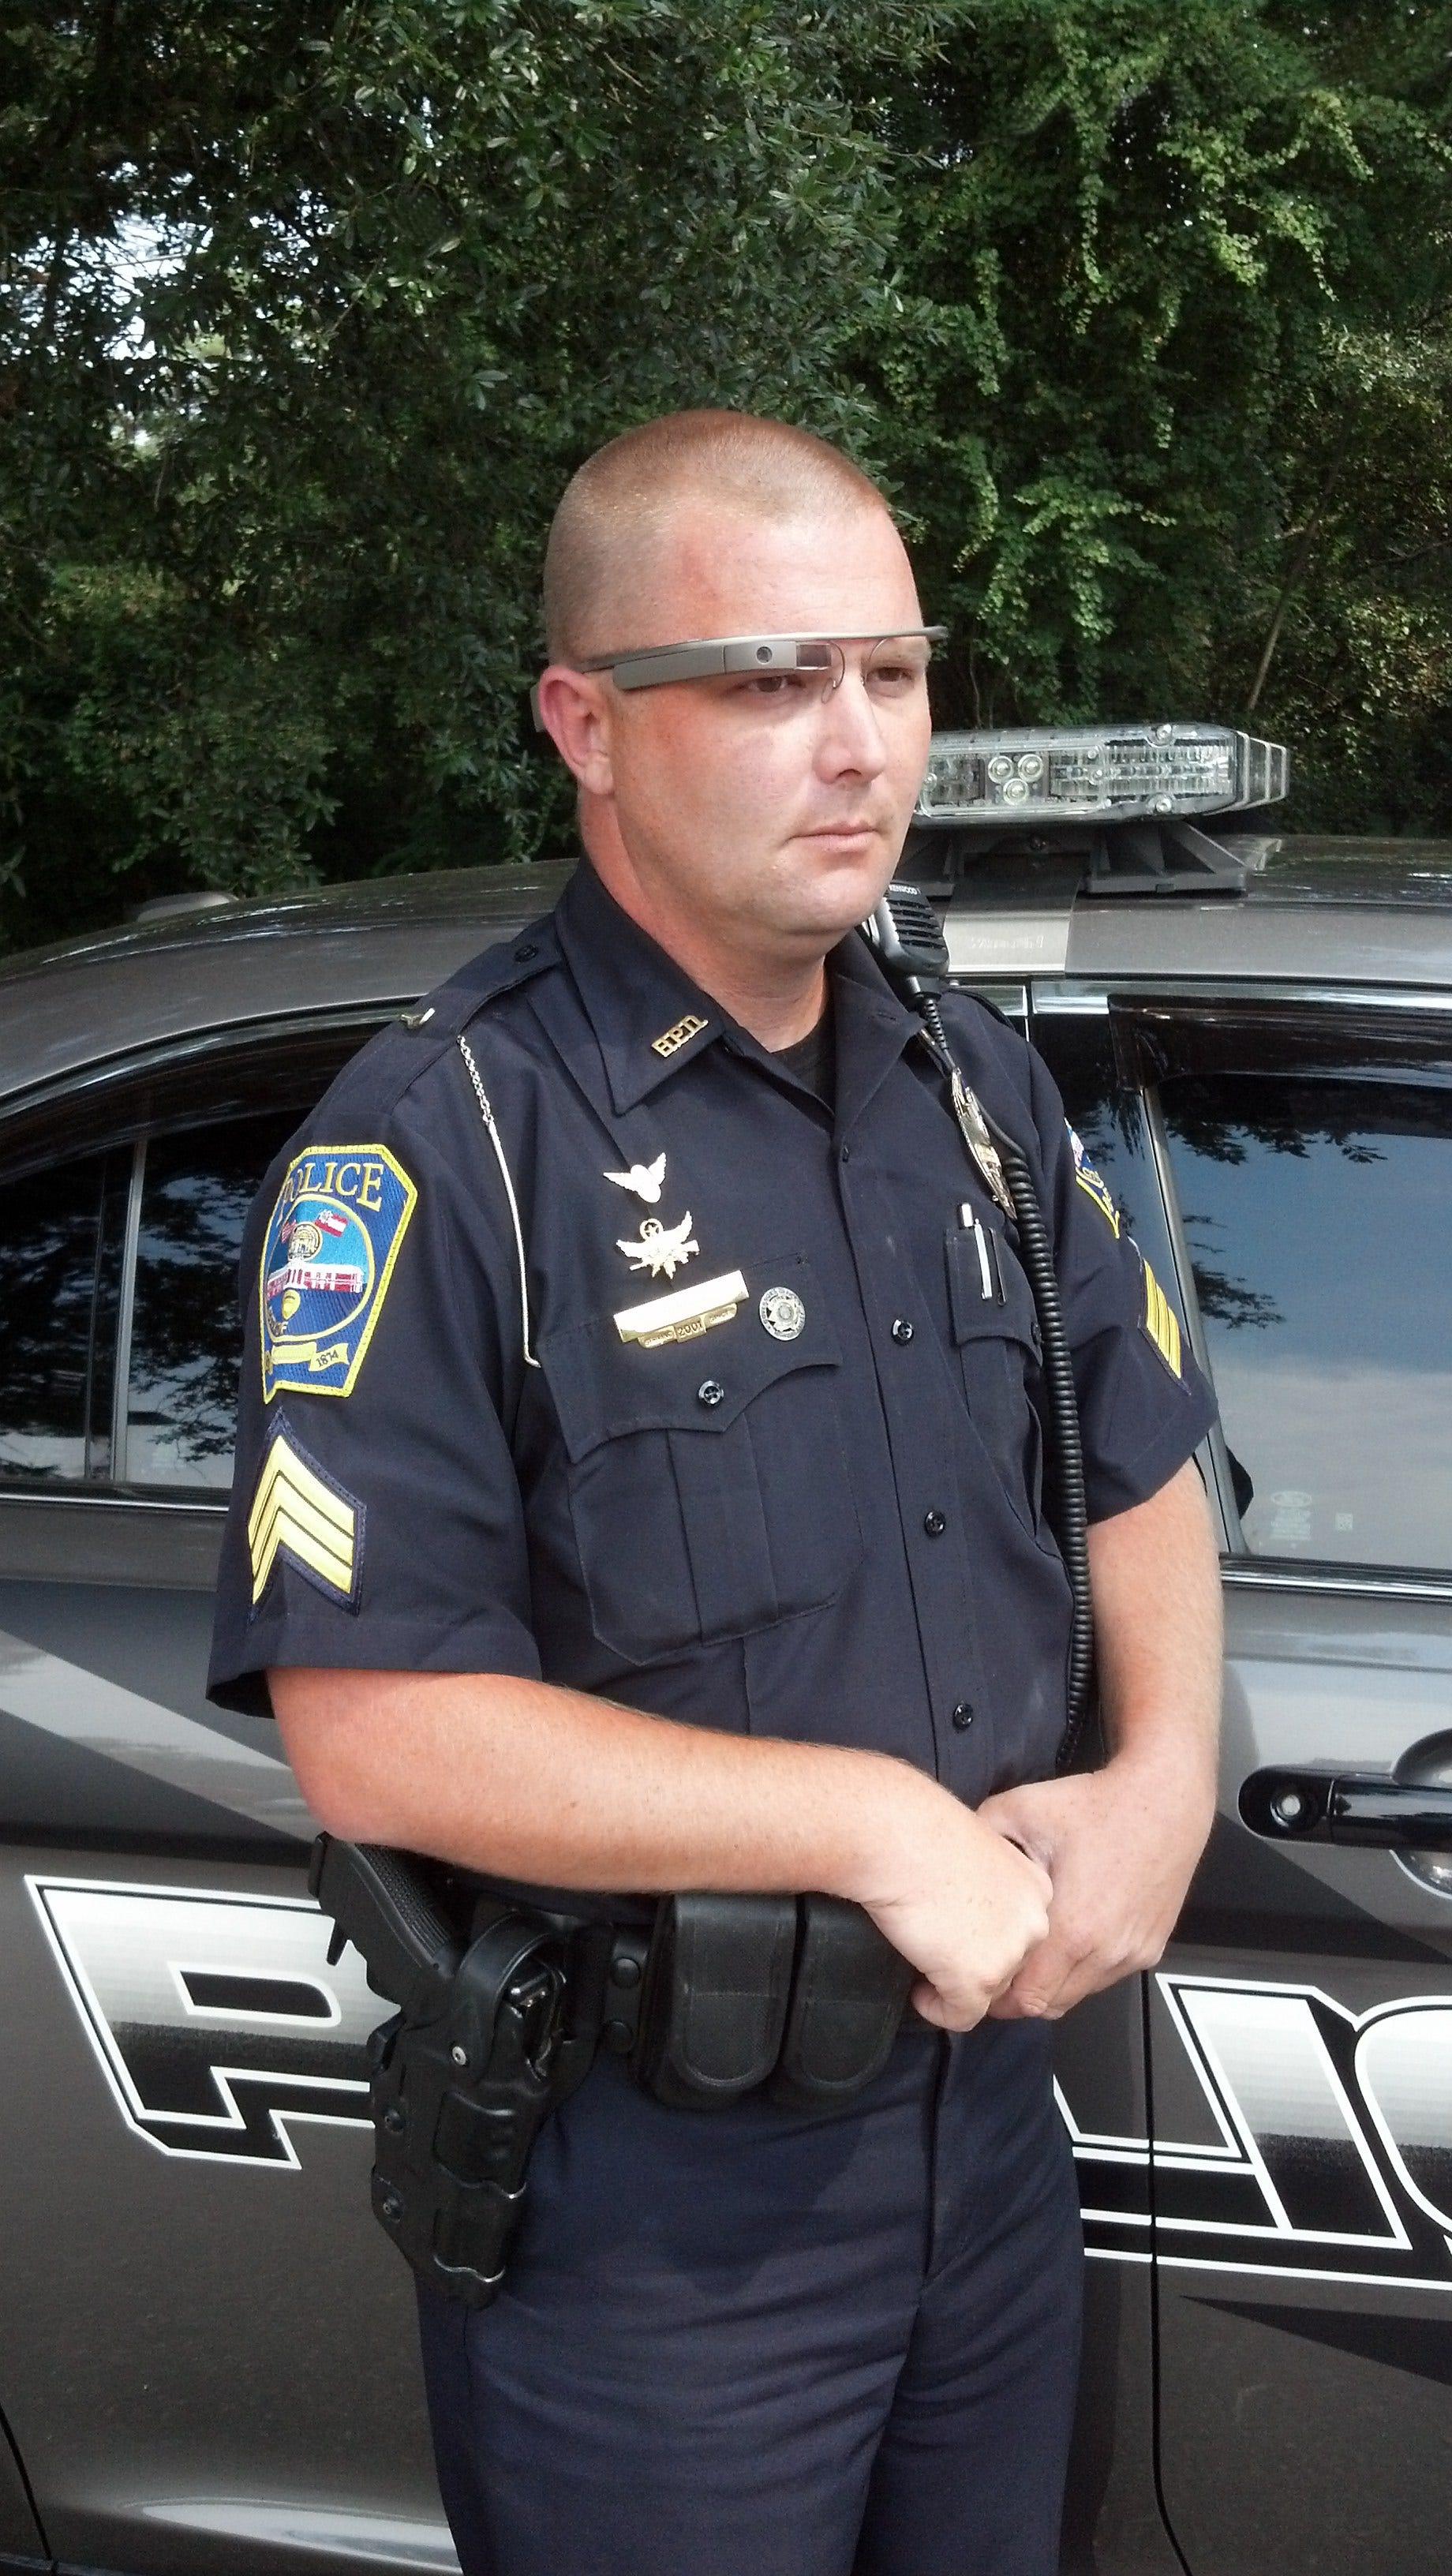 Cops Enforceable Tool